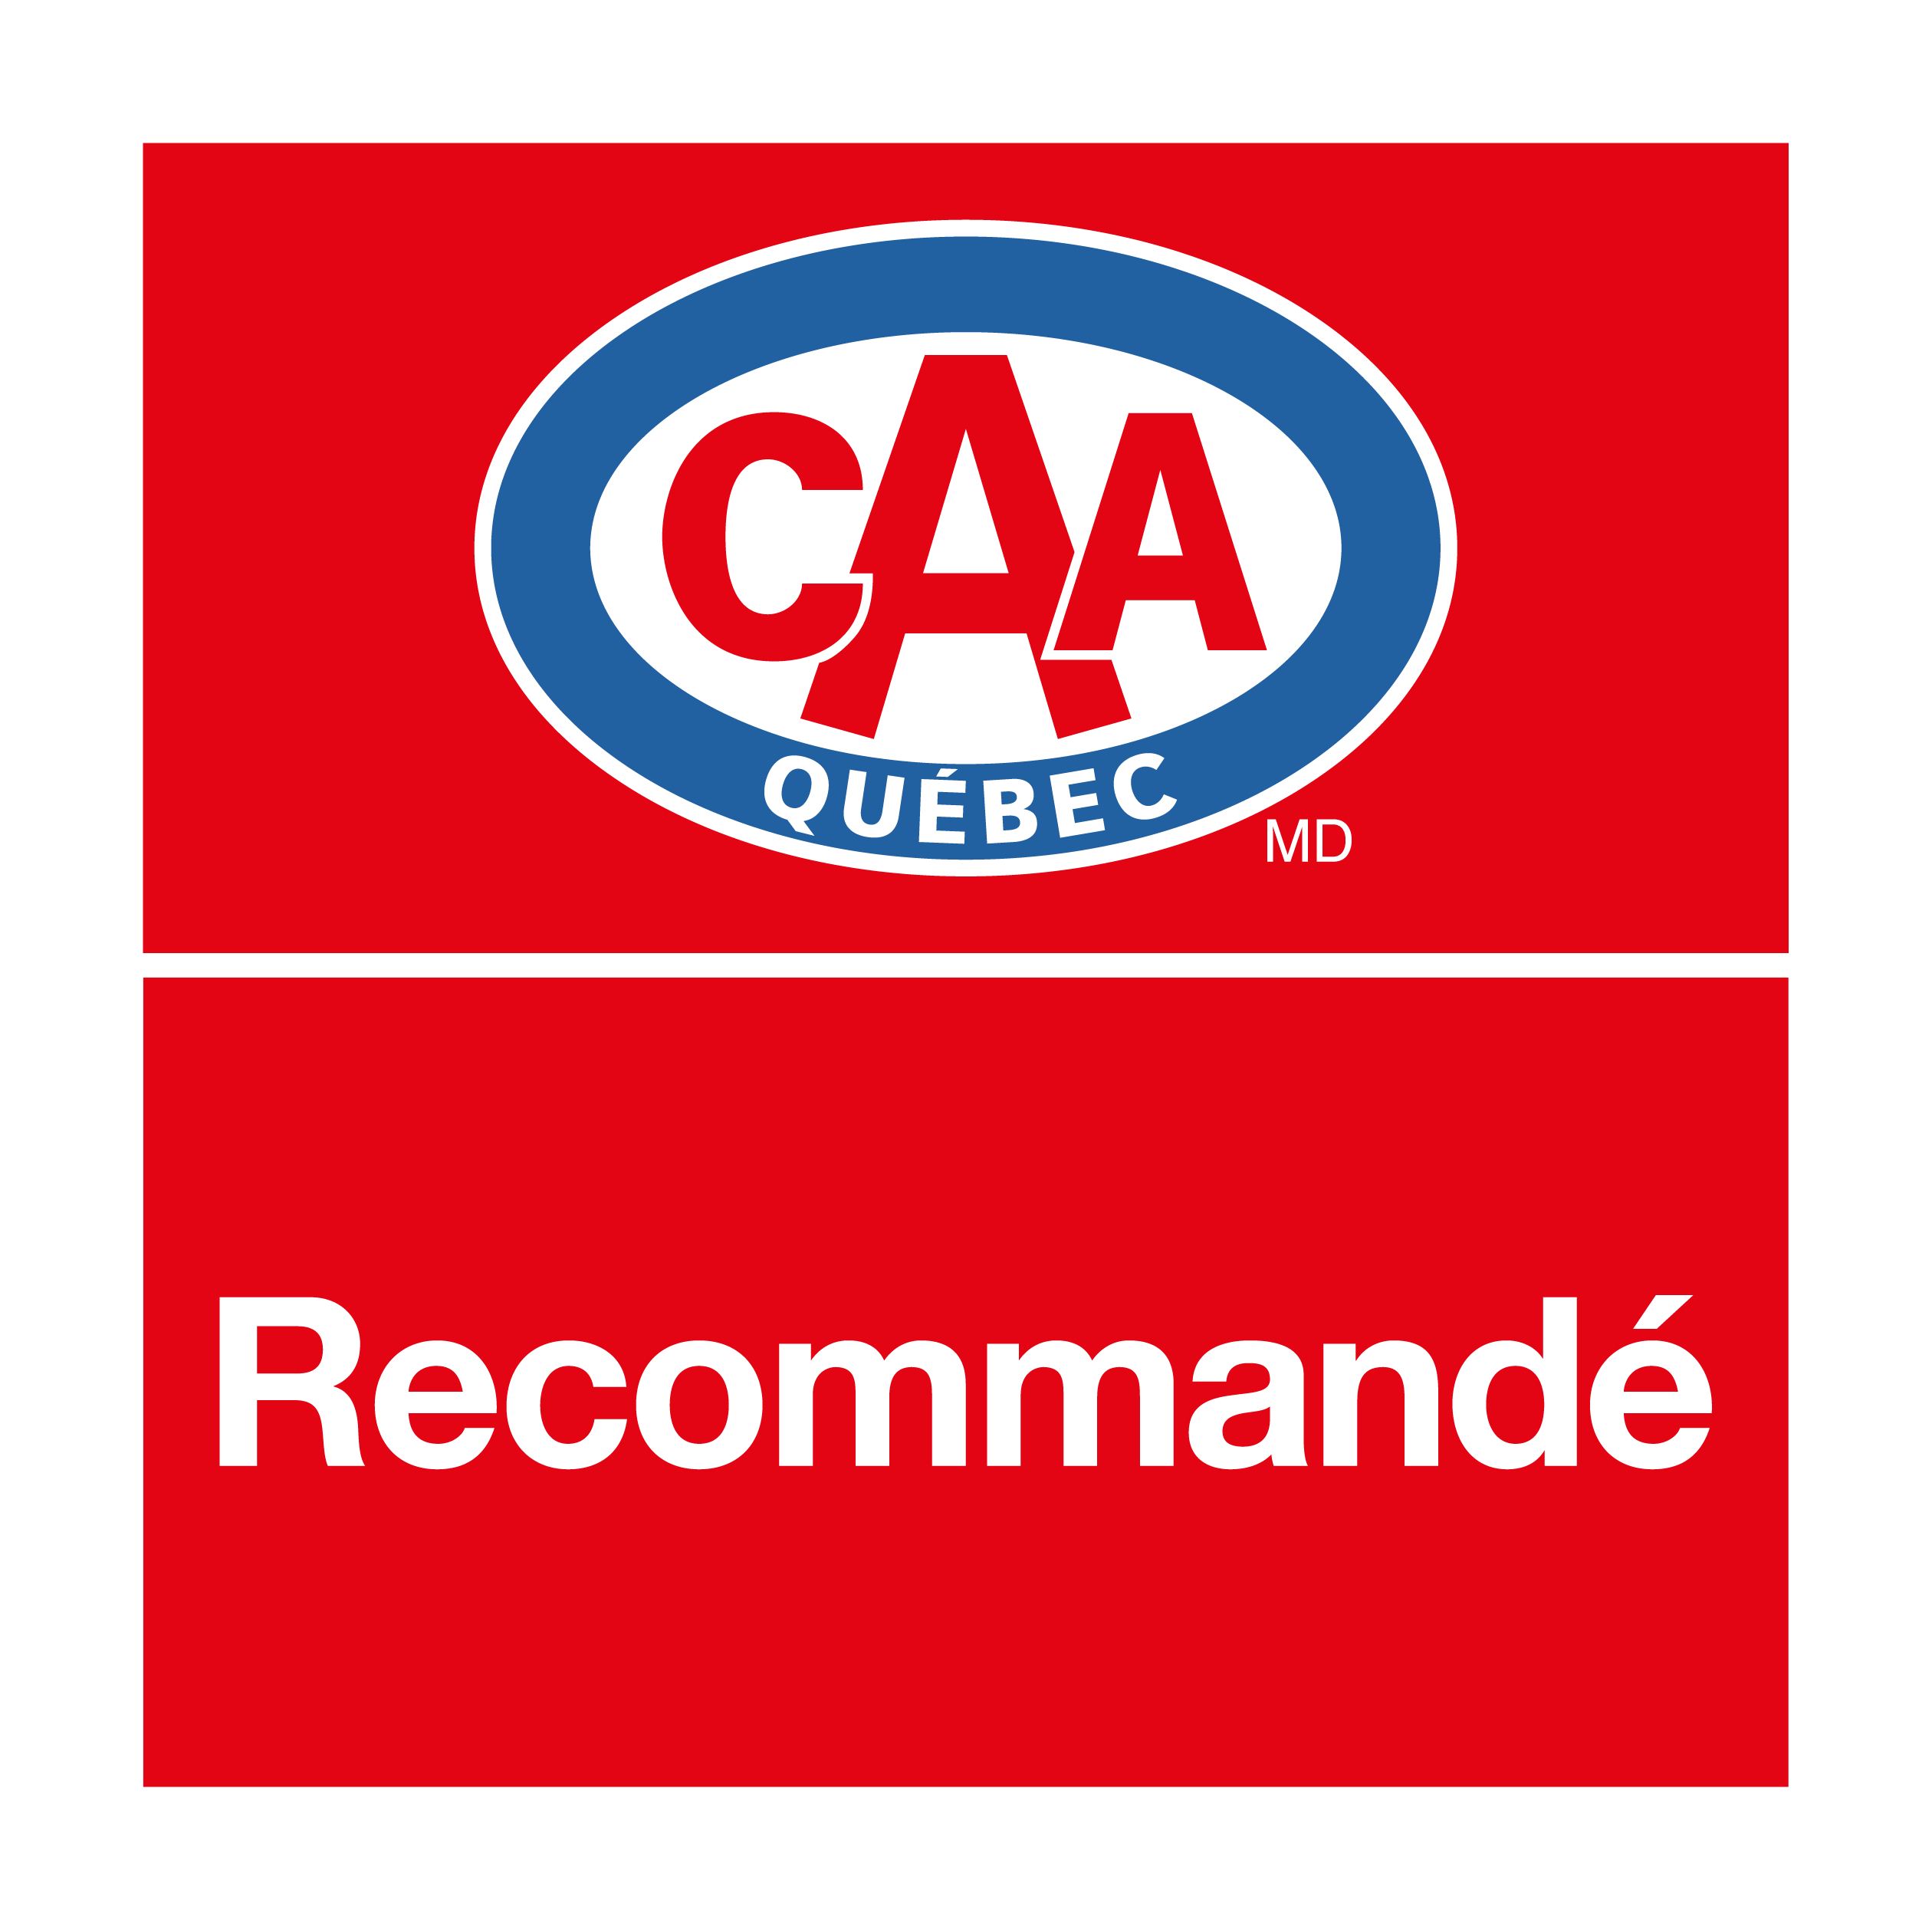 Nouveau logo CAA